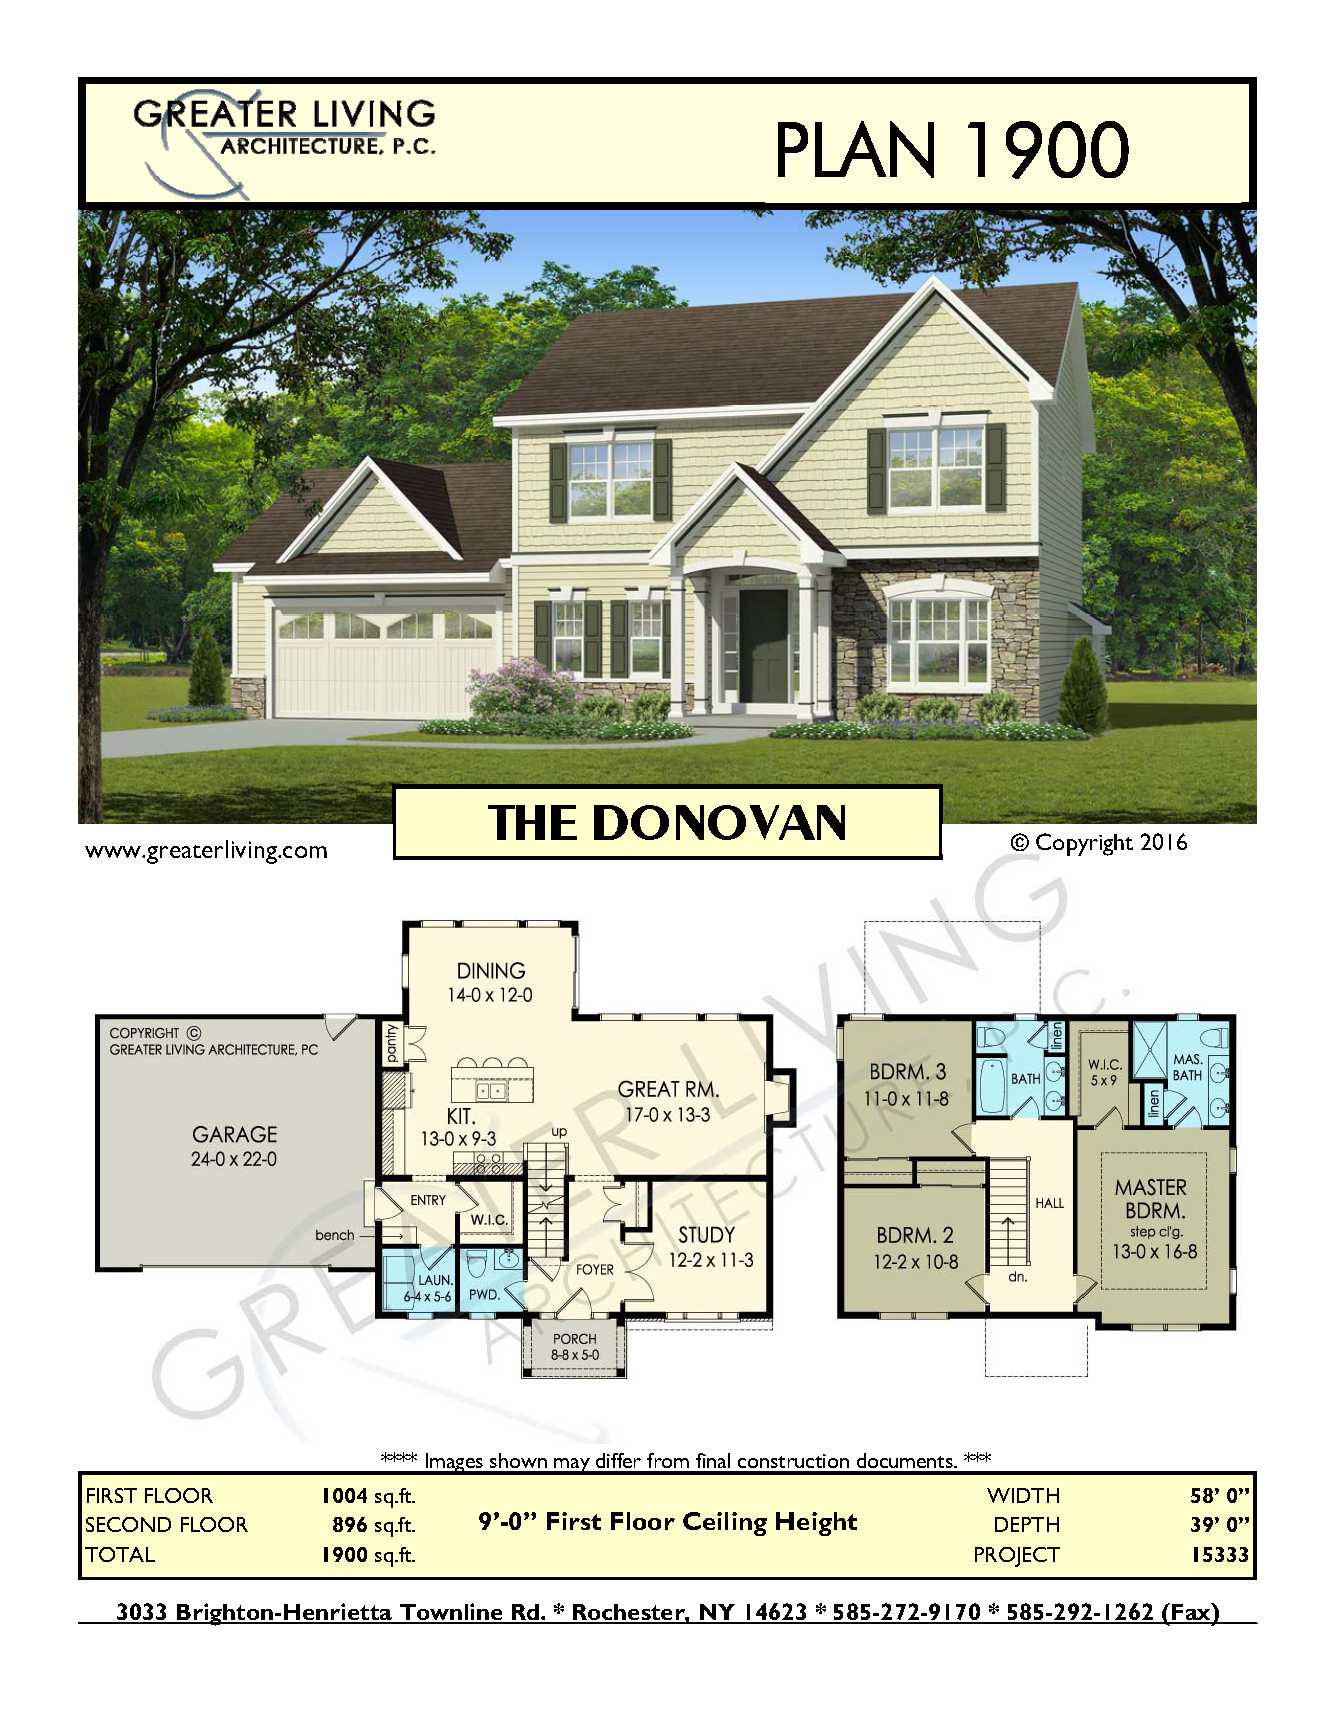 Plan 1900 THE DONOVAN House Plans 2 Story House Plan